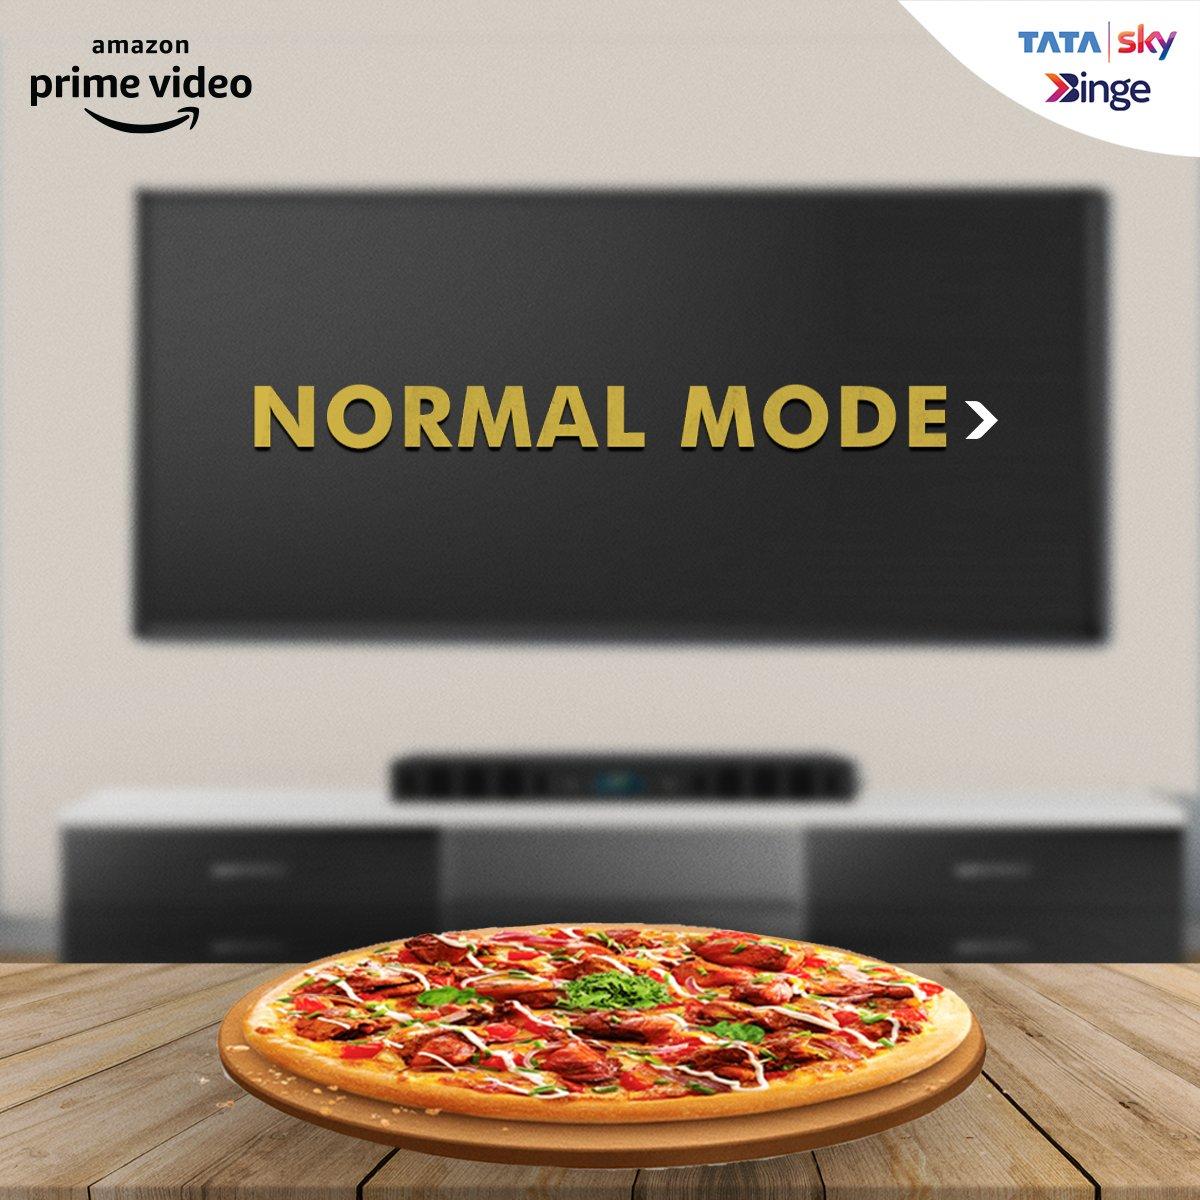 Tell us what's your mode for January 15? Watch Tandav on @PrimeVideoIN with Tata Sky Binge  Click here to get BINGE-ING-   #EntertainmentKoBadaKaro #Tandav #TandavOnPrime #BingeKaro #TataSkyBingeKaro #Binge #Bingewatch #Movies #Entertainment #LateNightBinge